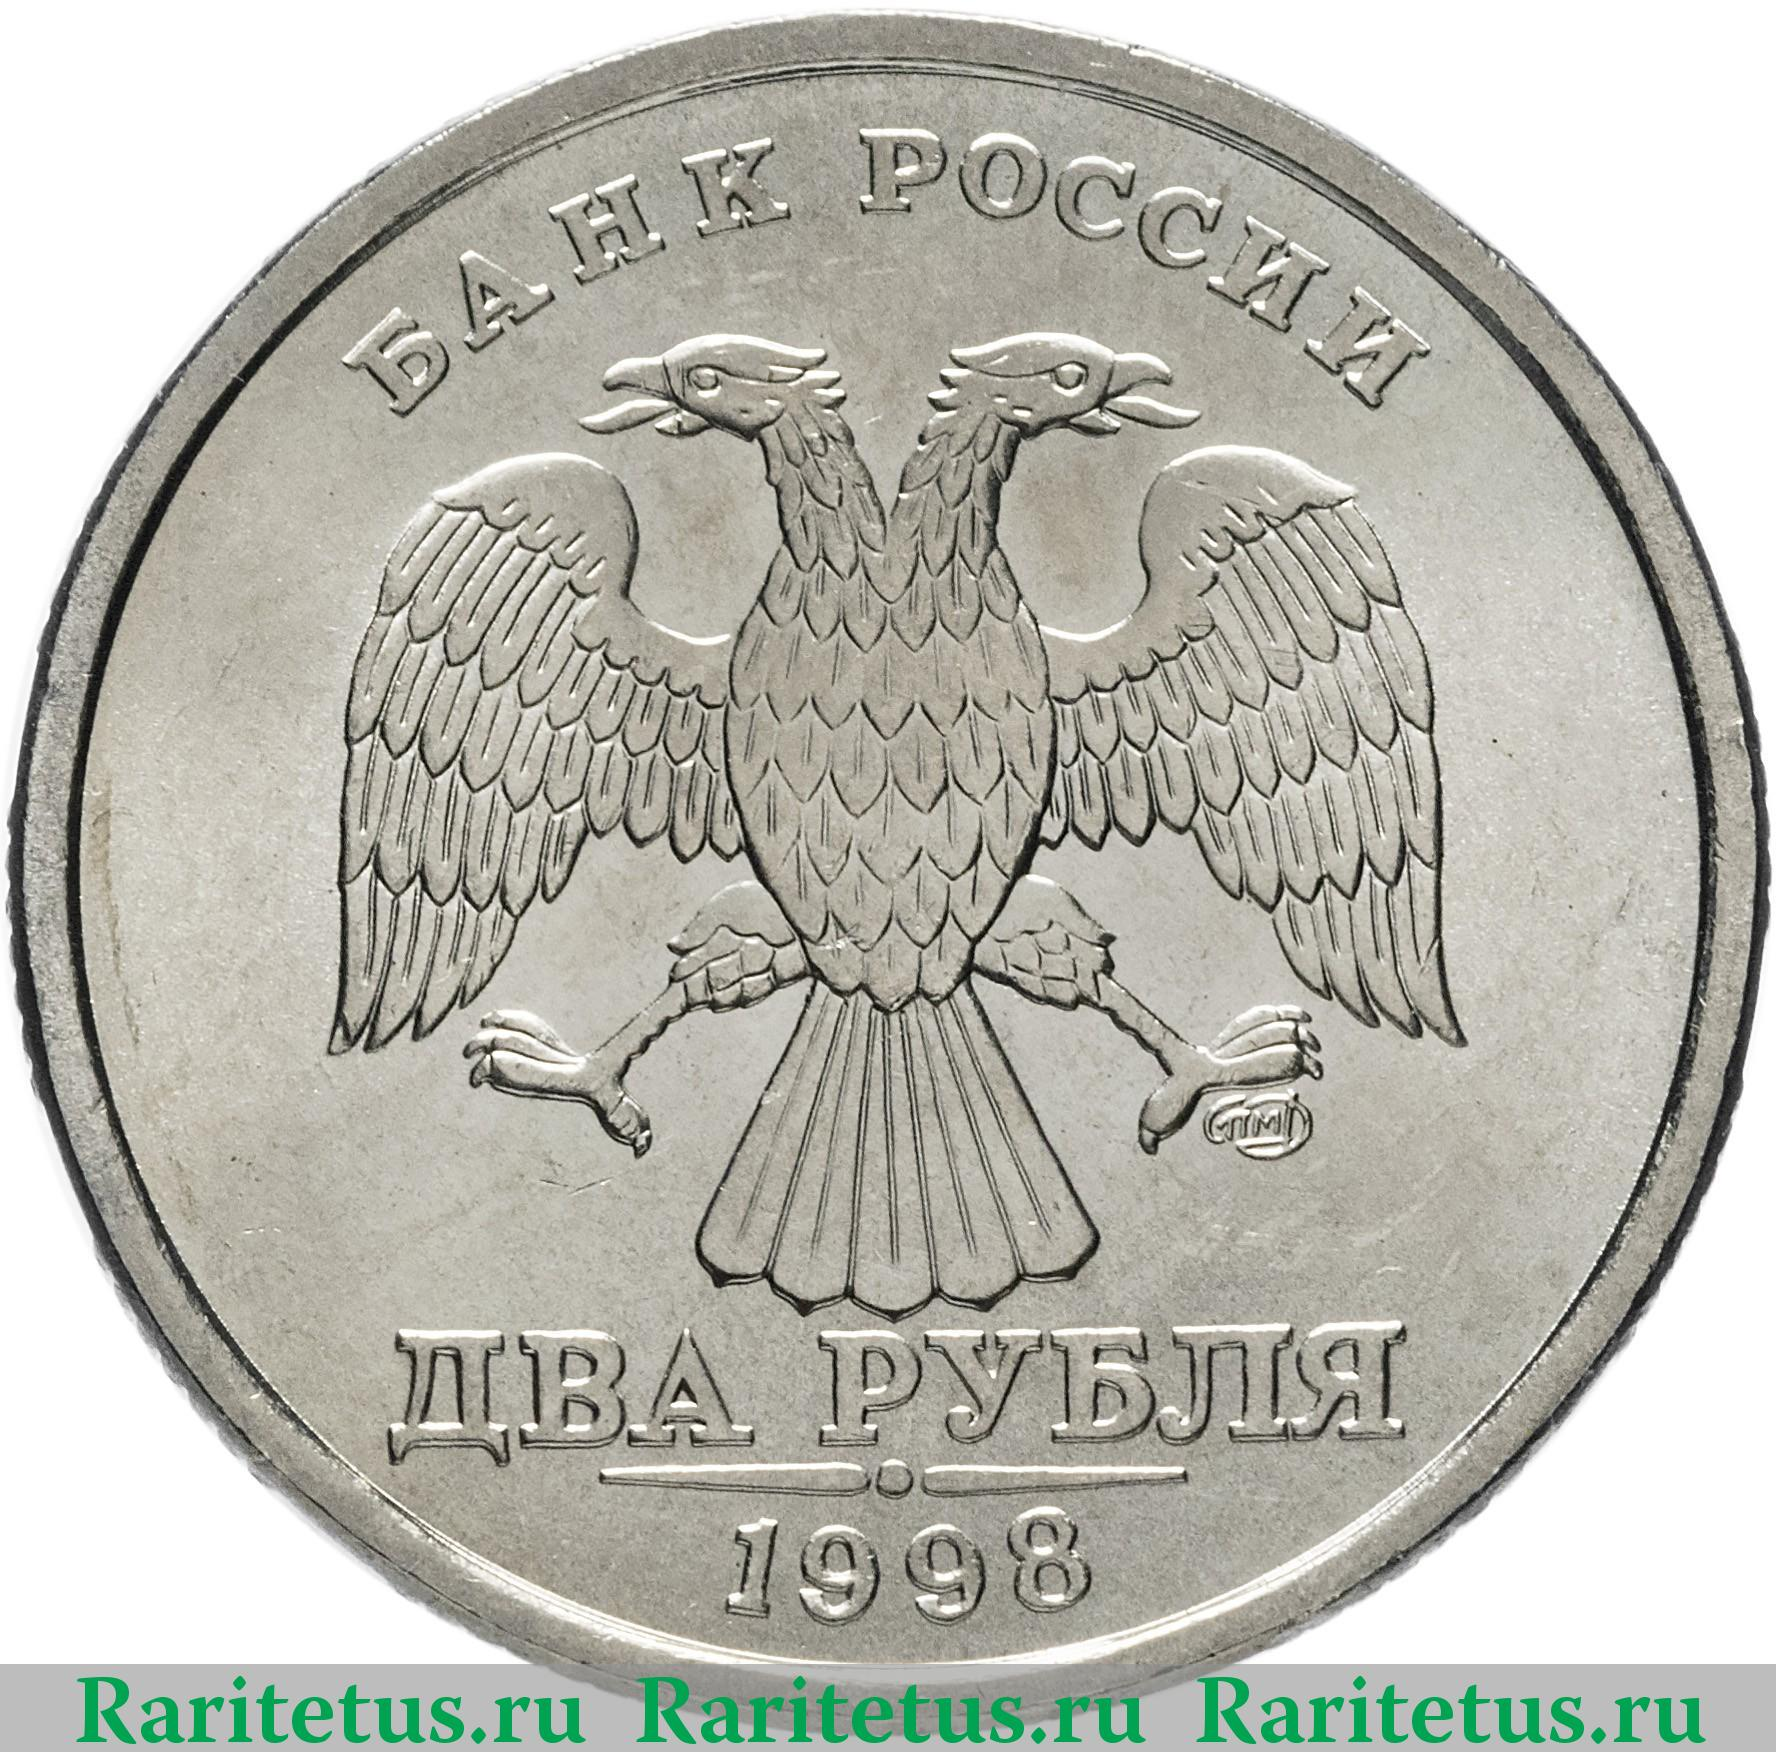 Монета 2 рубля 1998 года стоимость спмд цена 2 копейки 1872 года